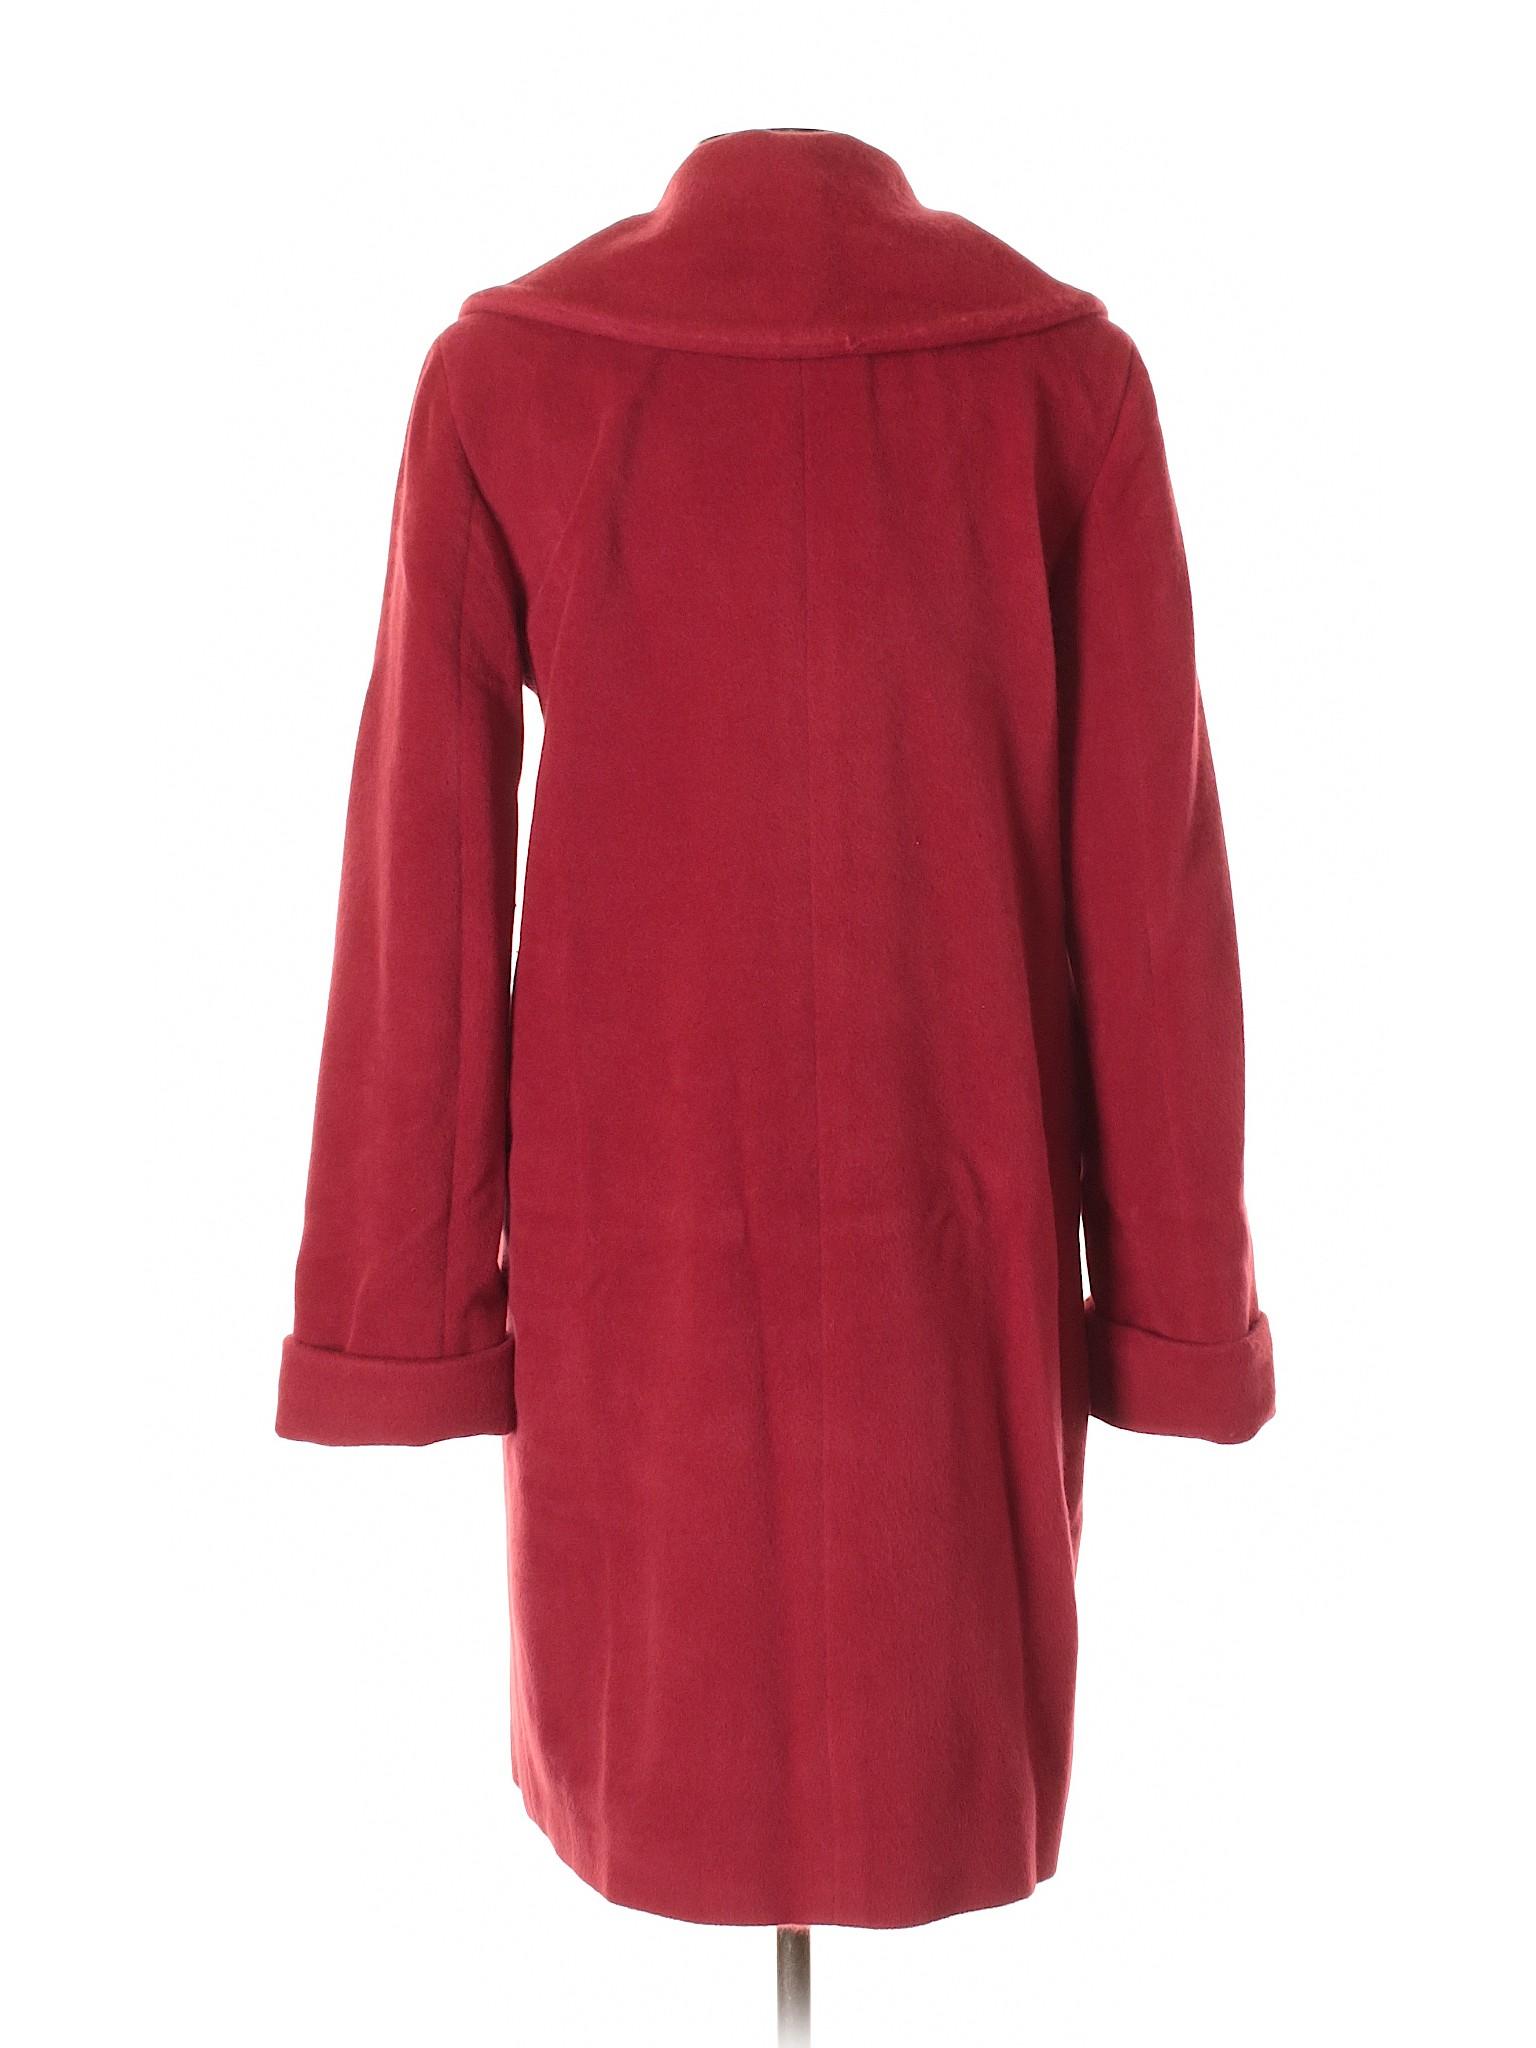 Haan Coat Cole Coat Haan Boutique Boutique Boutique winter winter winter Cole wwR67fxOBq